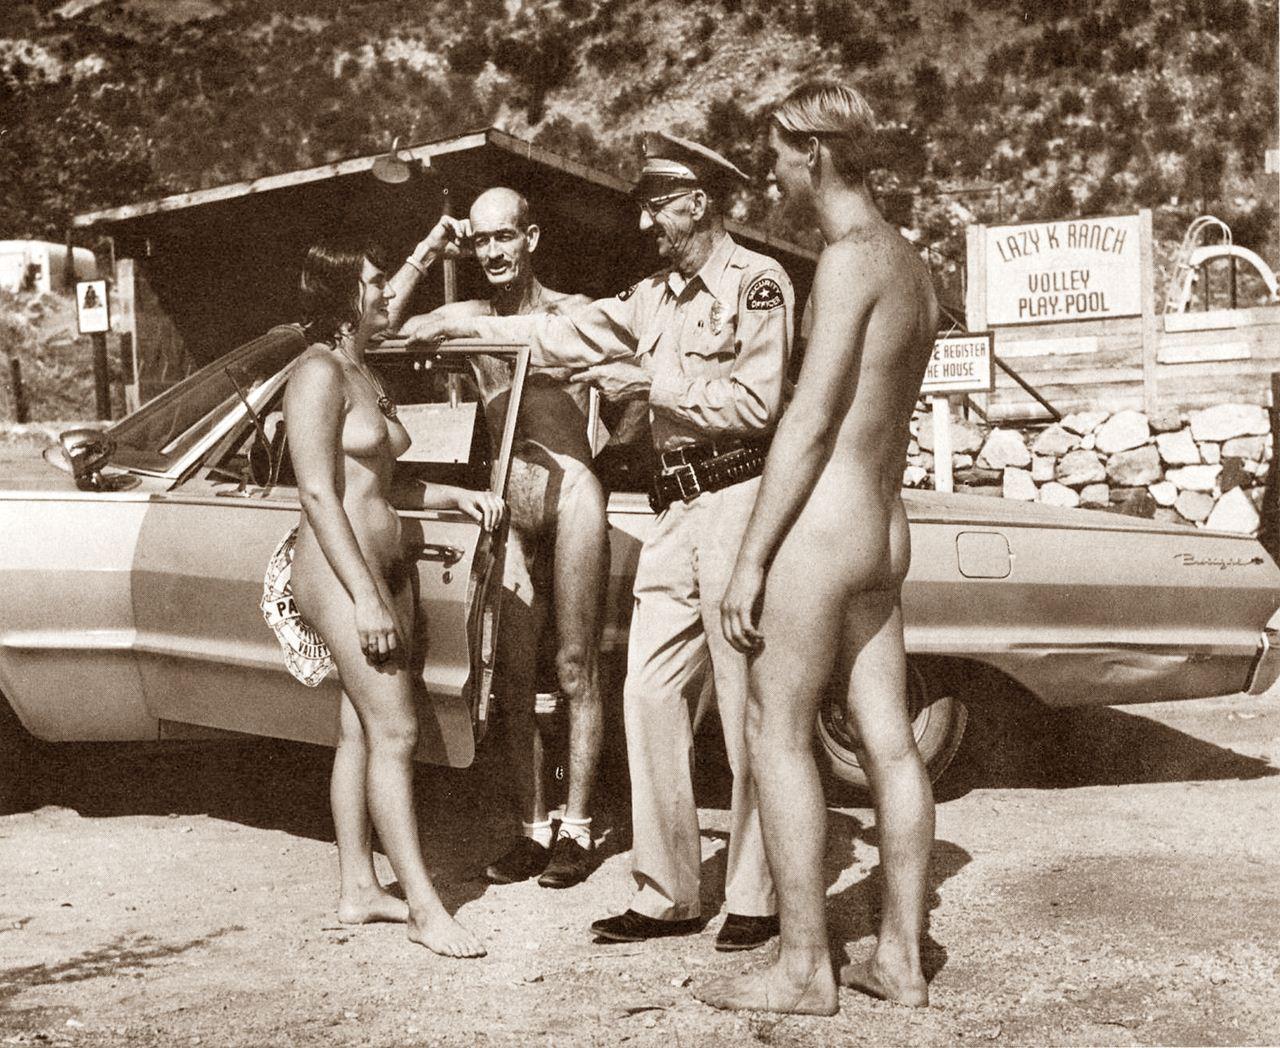 Nudist colony 1950 s uk